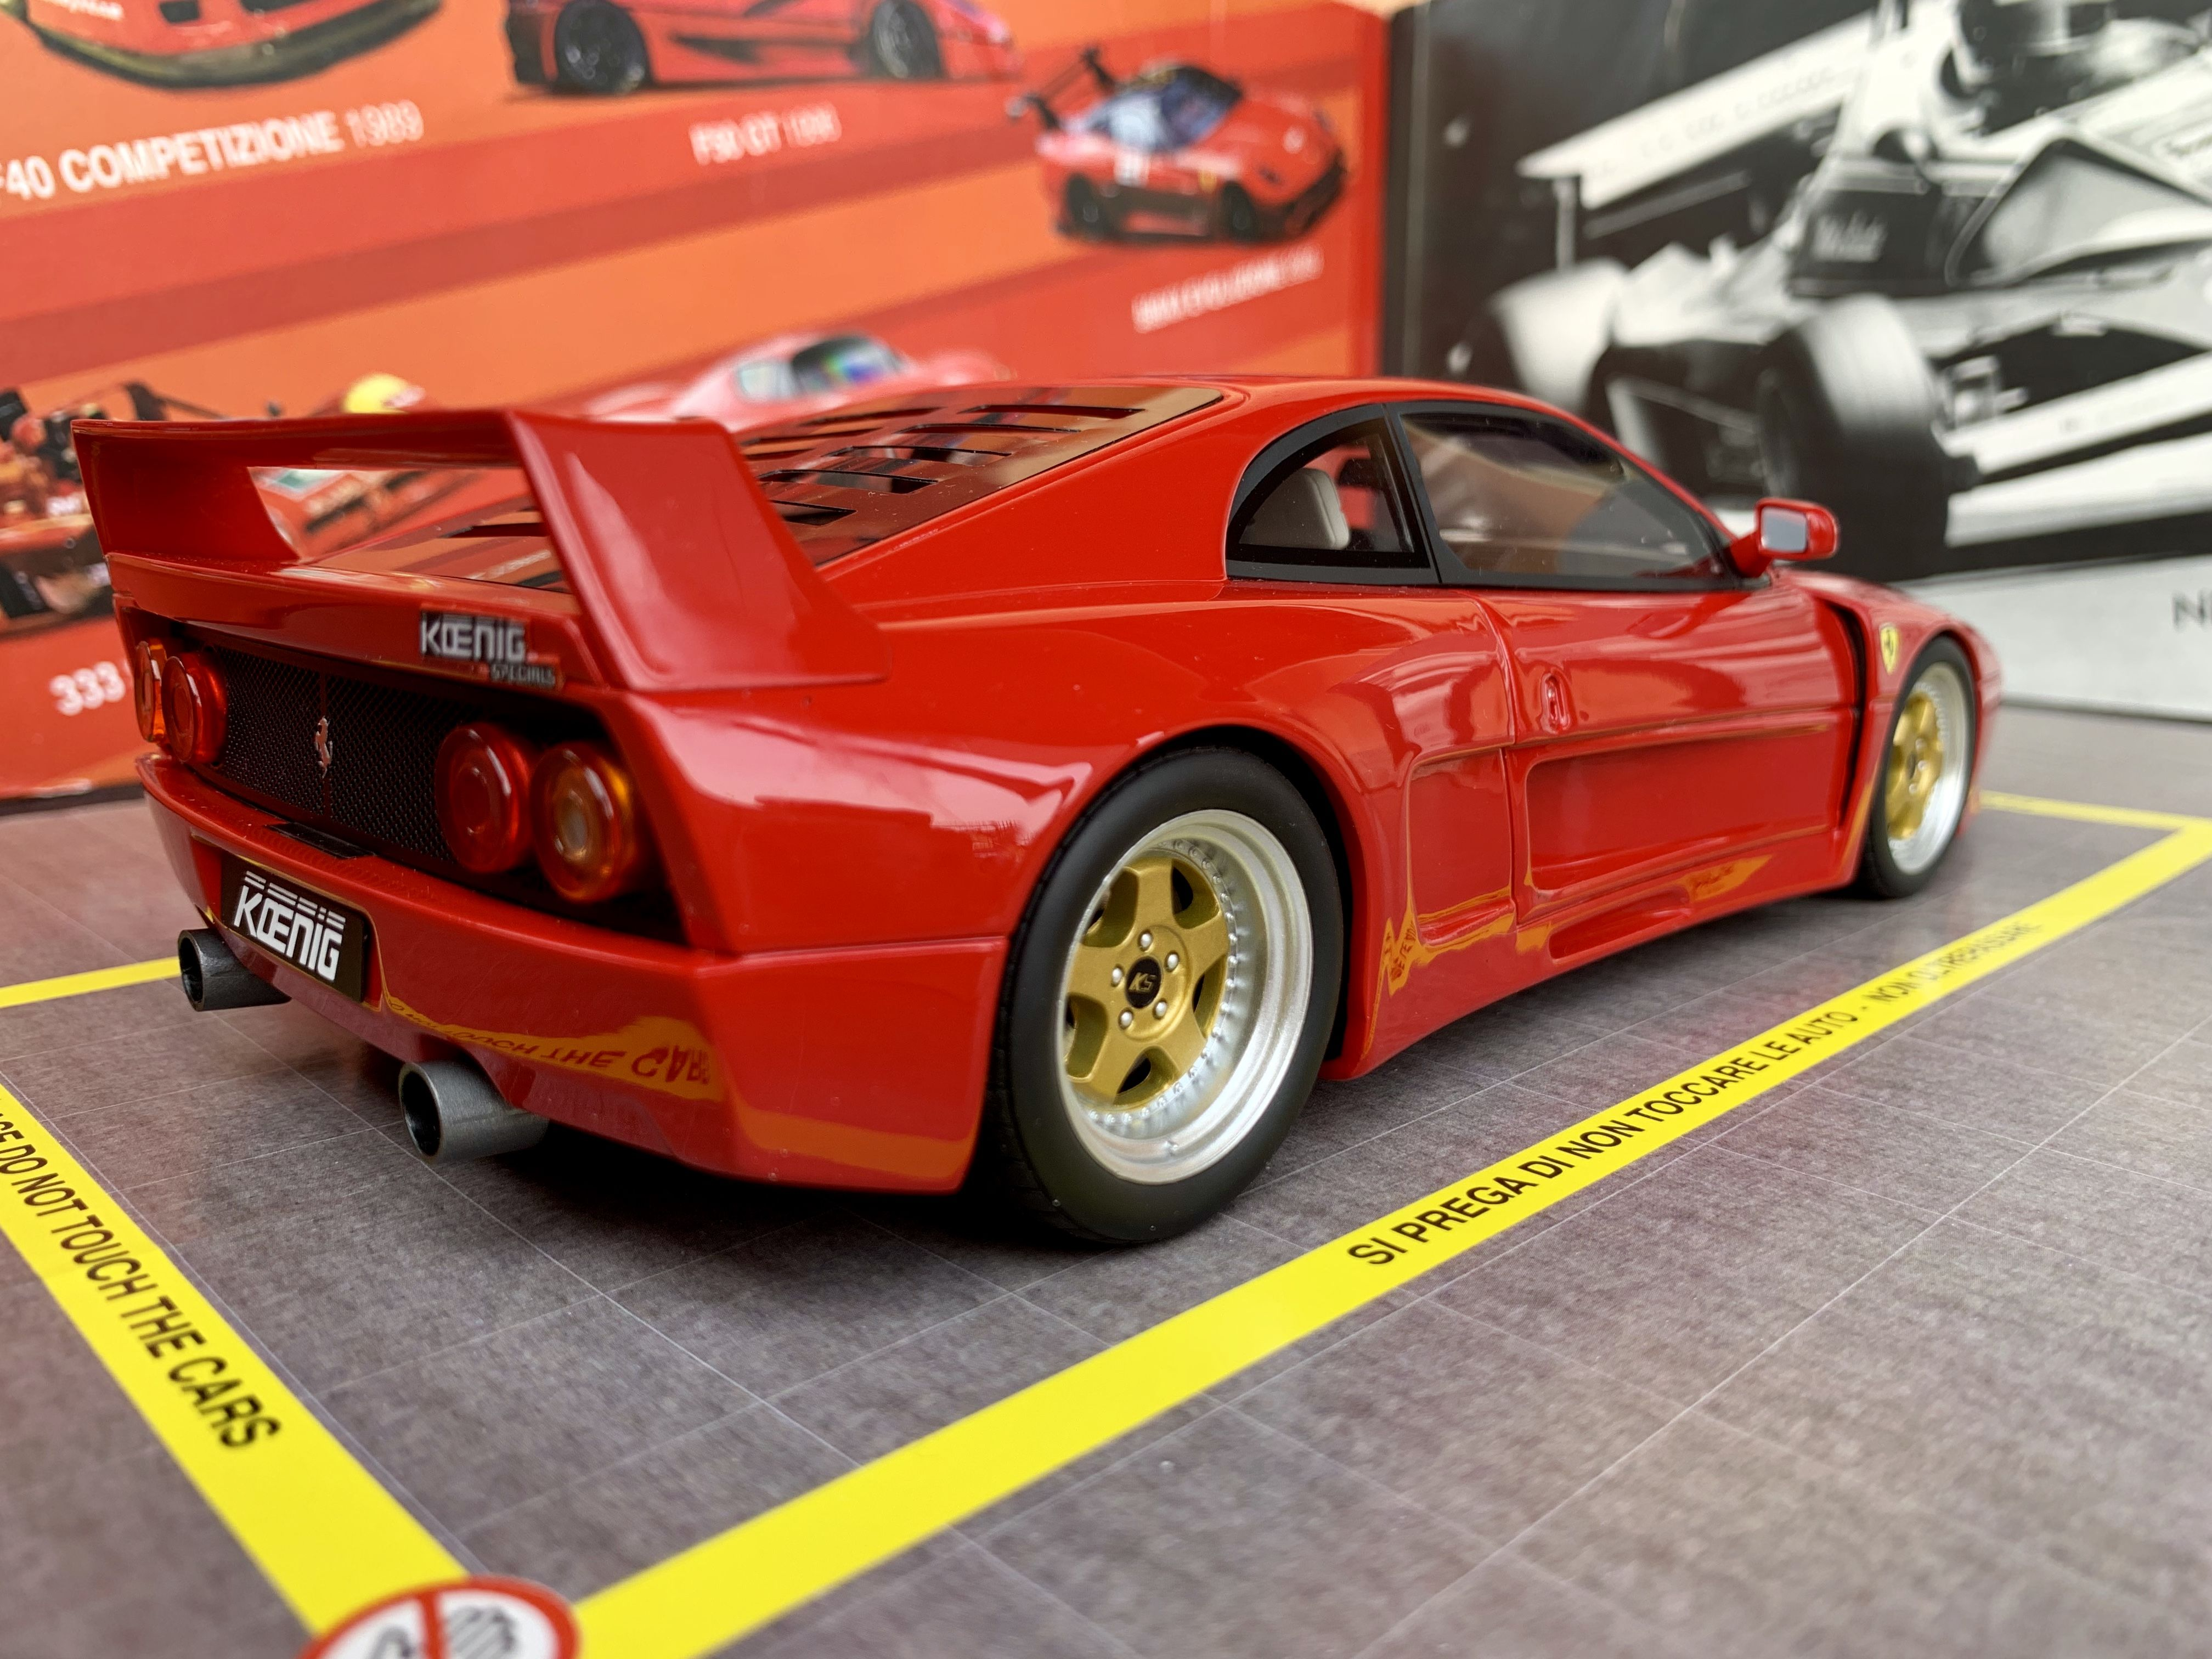 Ferrari F48 Koenig Specials By Gt Spirit 1 18 N 348 999 Minichamps